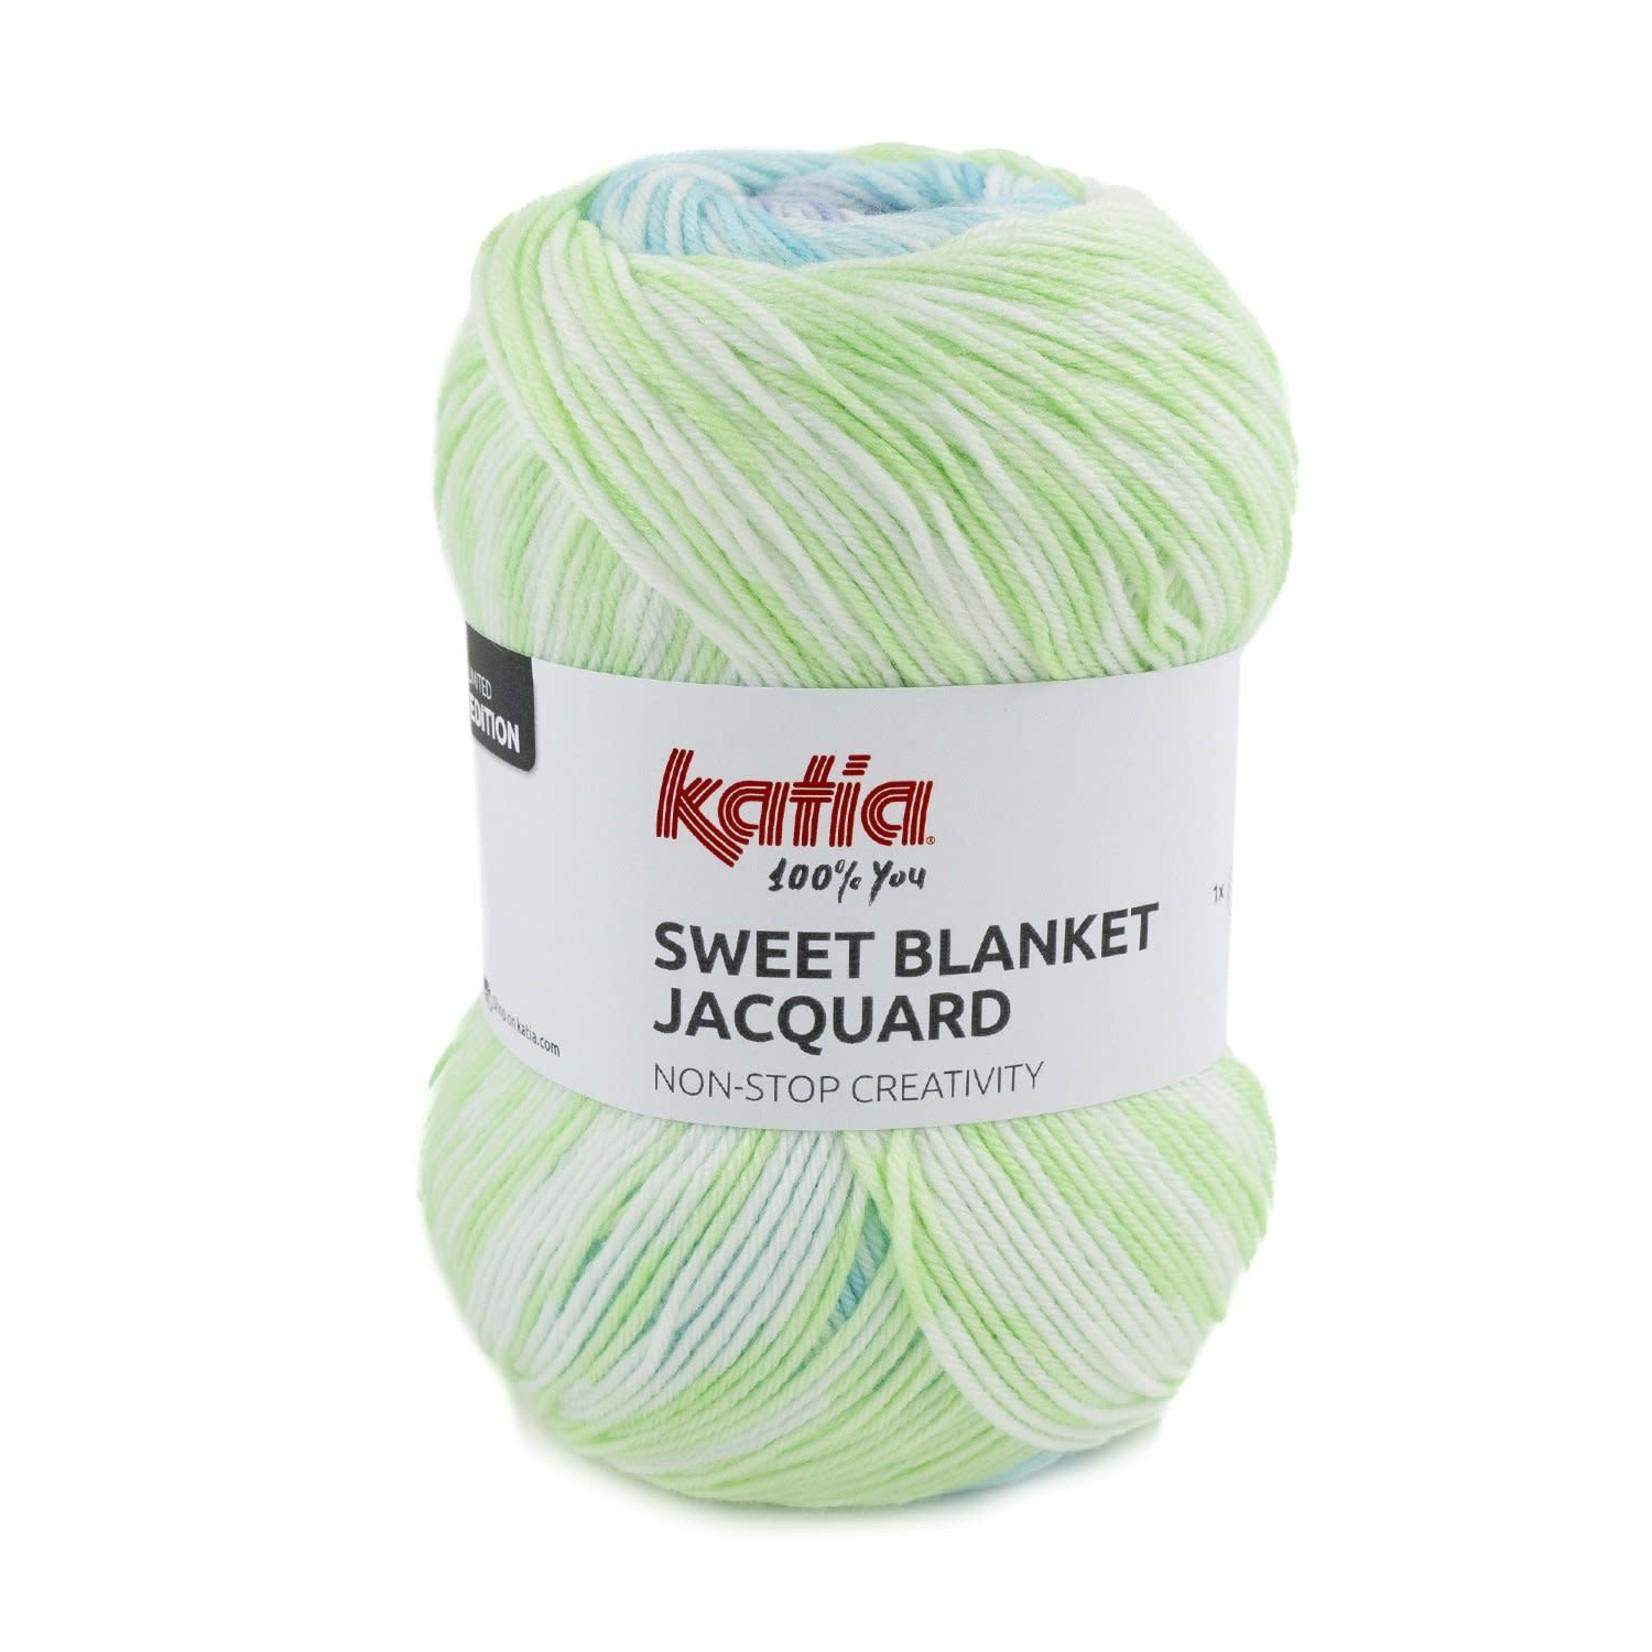 Katia Sweet Blanket Jacquard by Katia